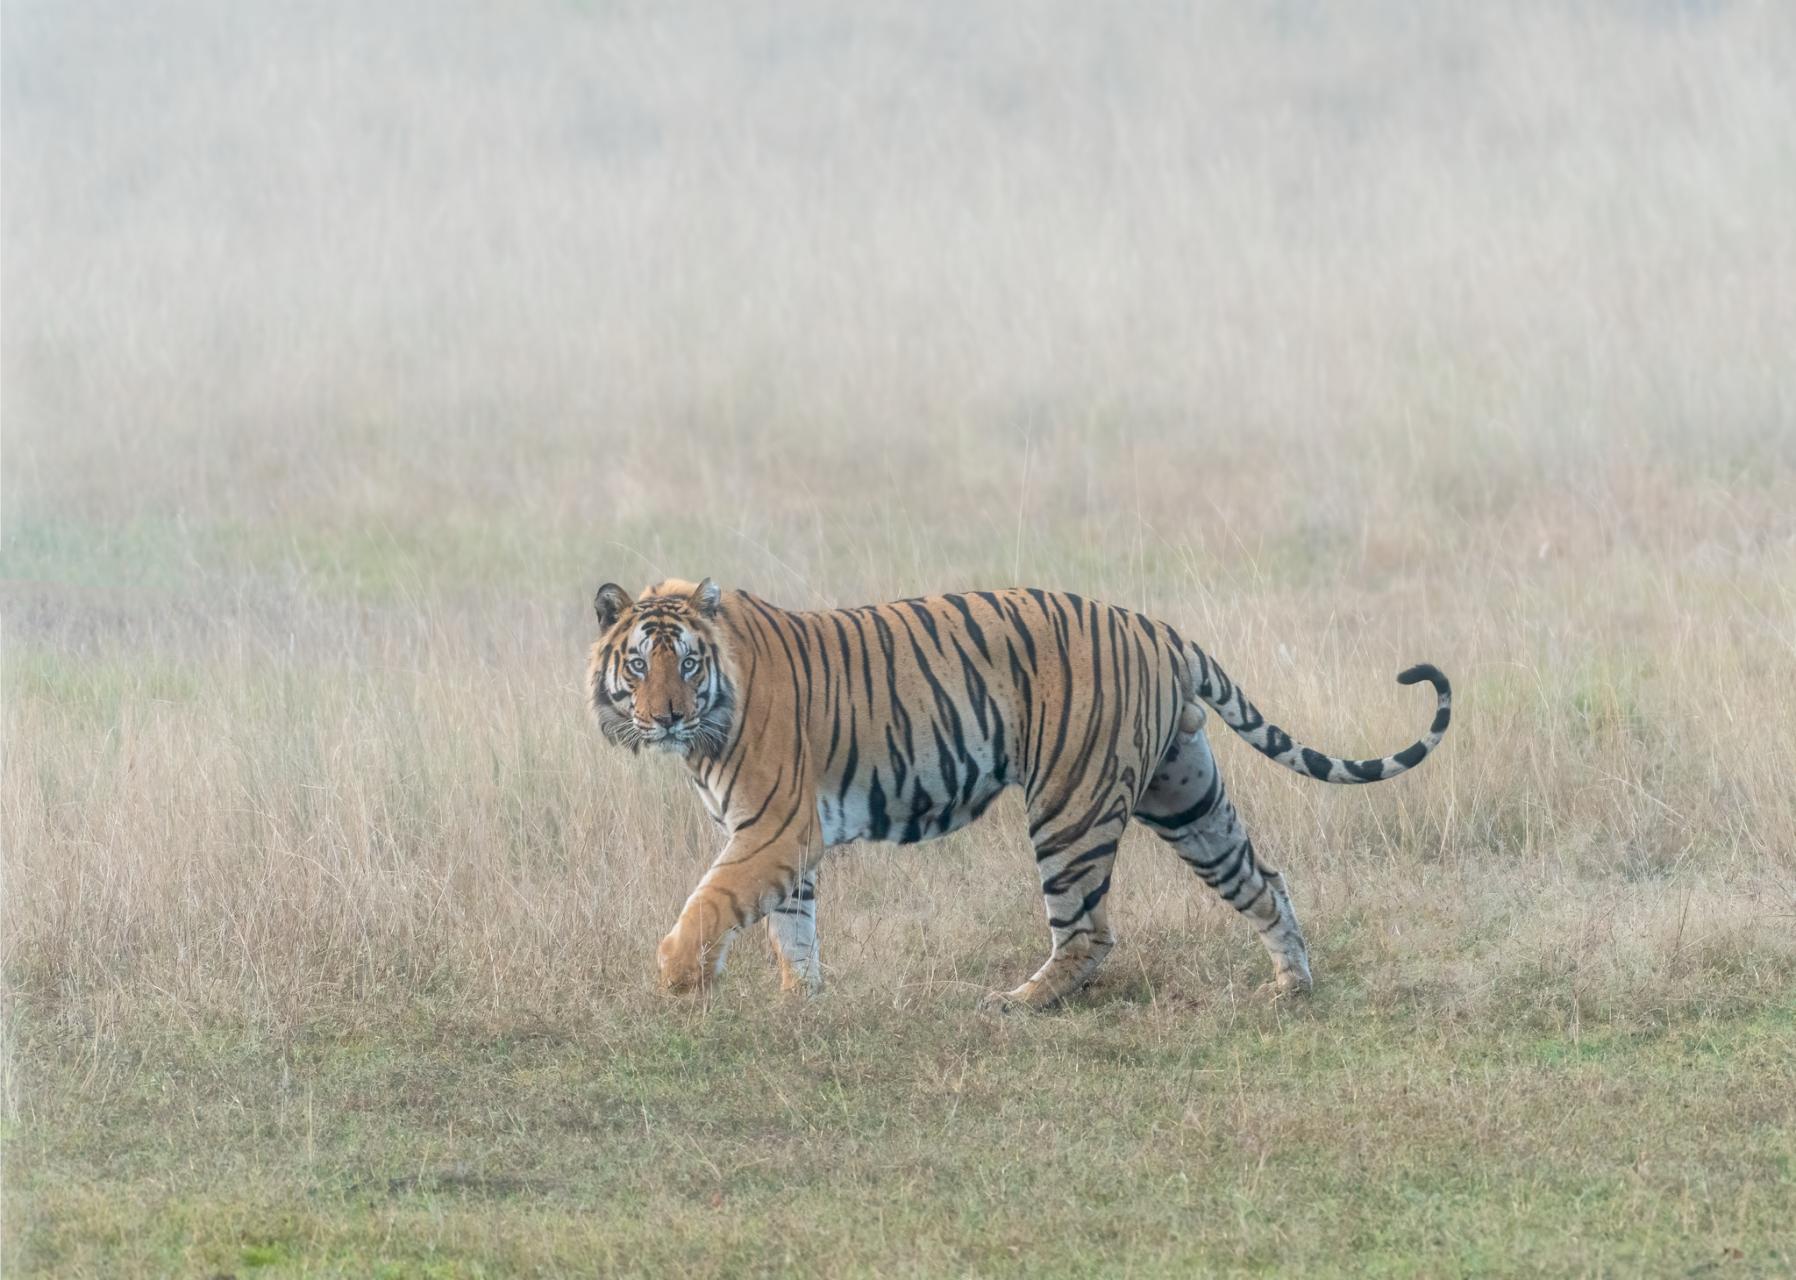 Tiger in Mist